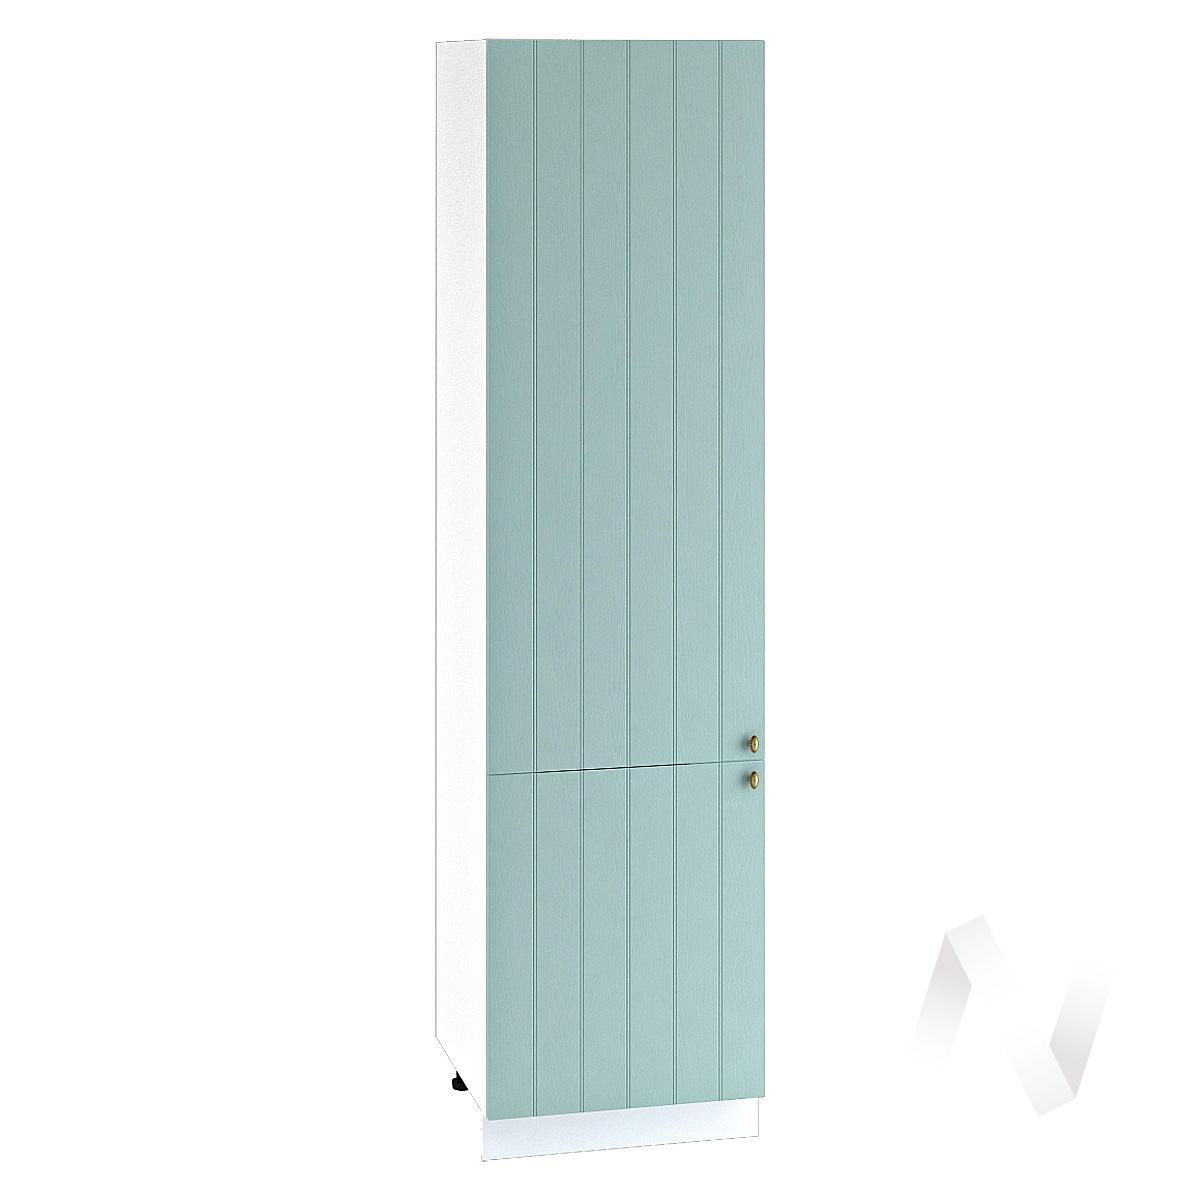 "Кухня ""Прованс"": Шкаф пенал 600, ШП 600НМ (голубой/корпус белый)"